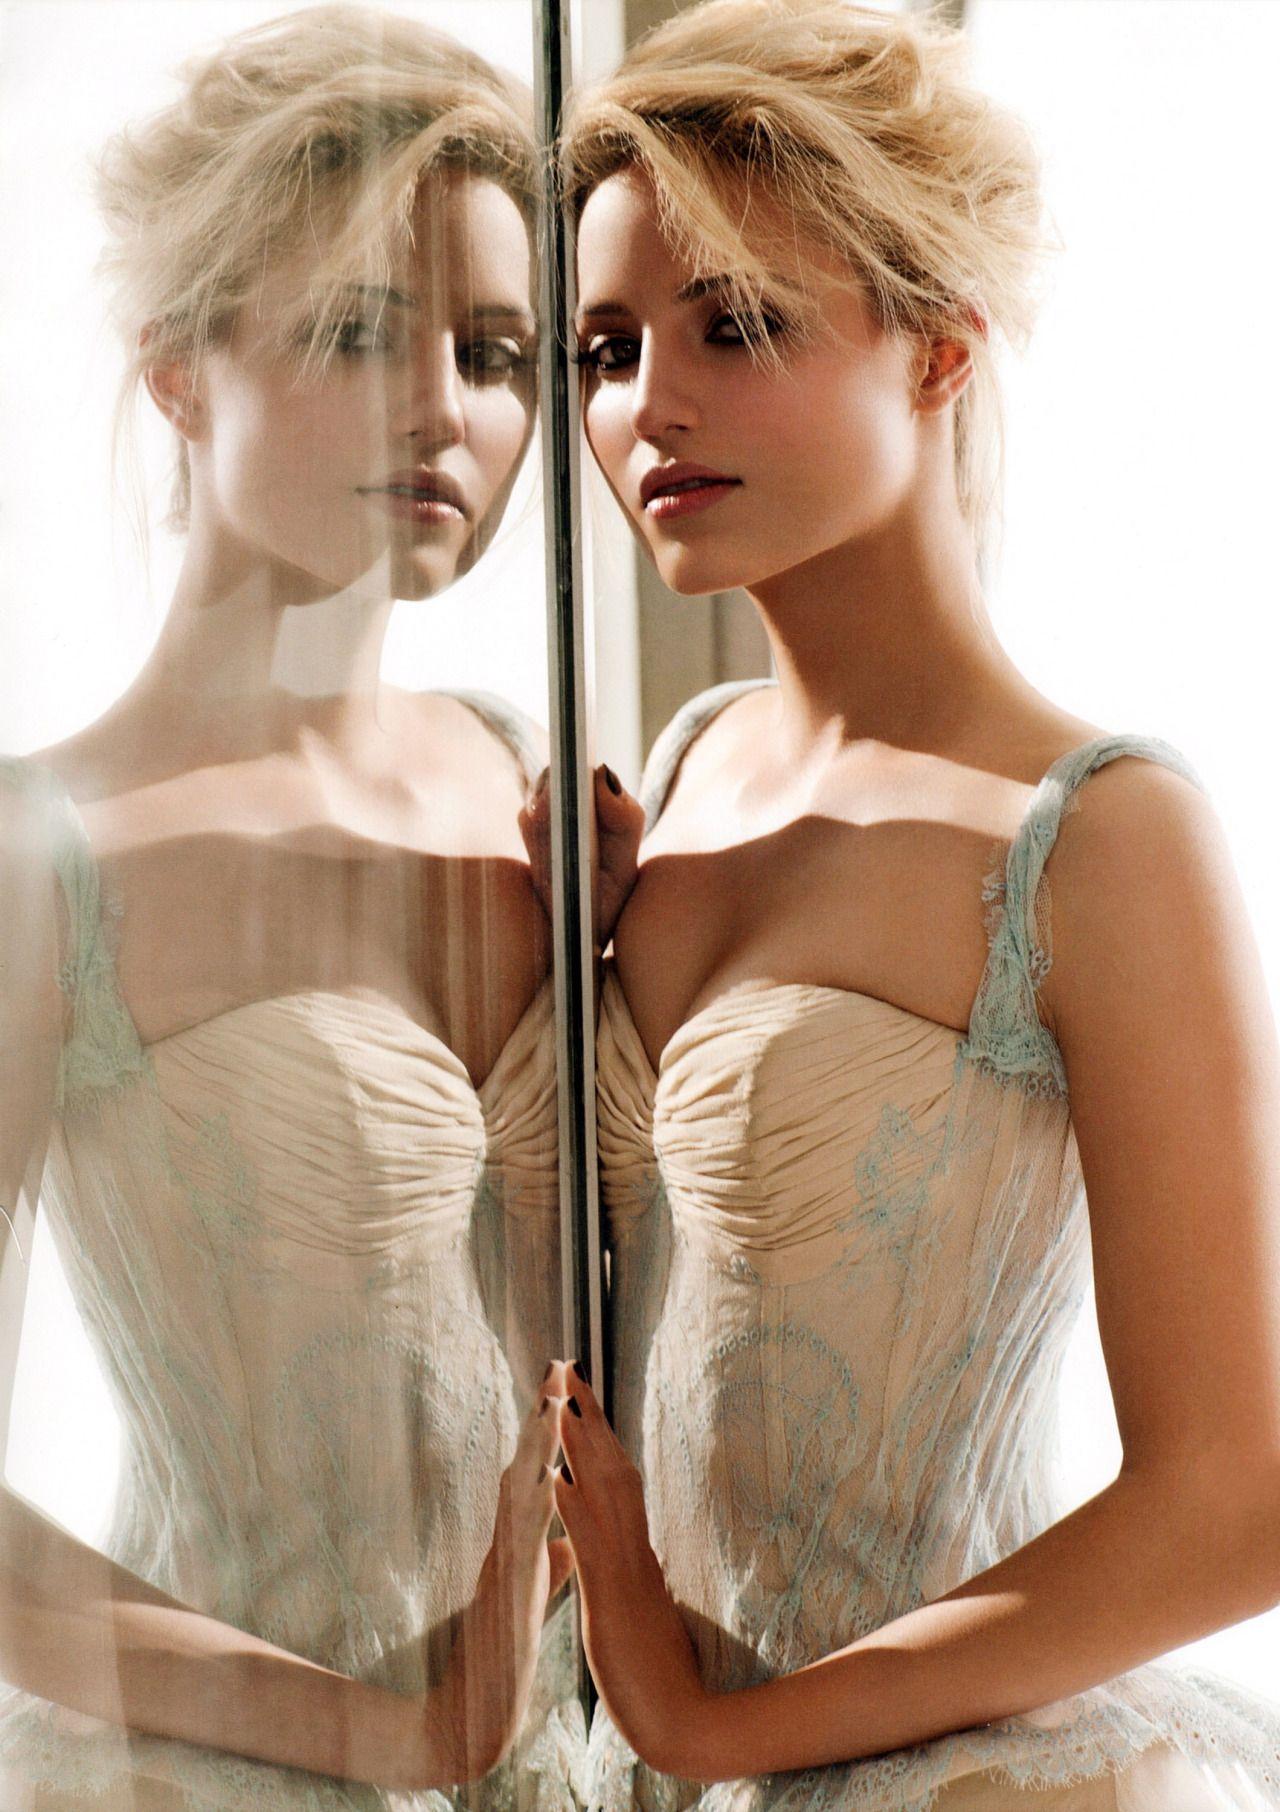 Dianna agron wedding dress  DazzlingDianna  DiannaAgron Glee   Pinterest  Dianna